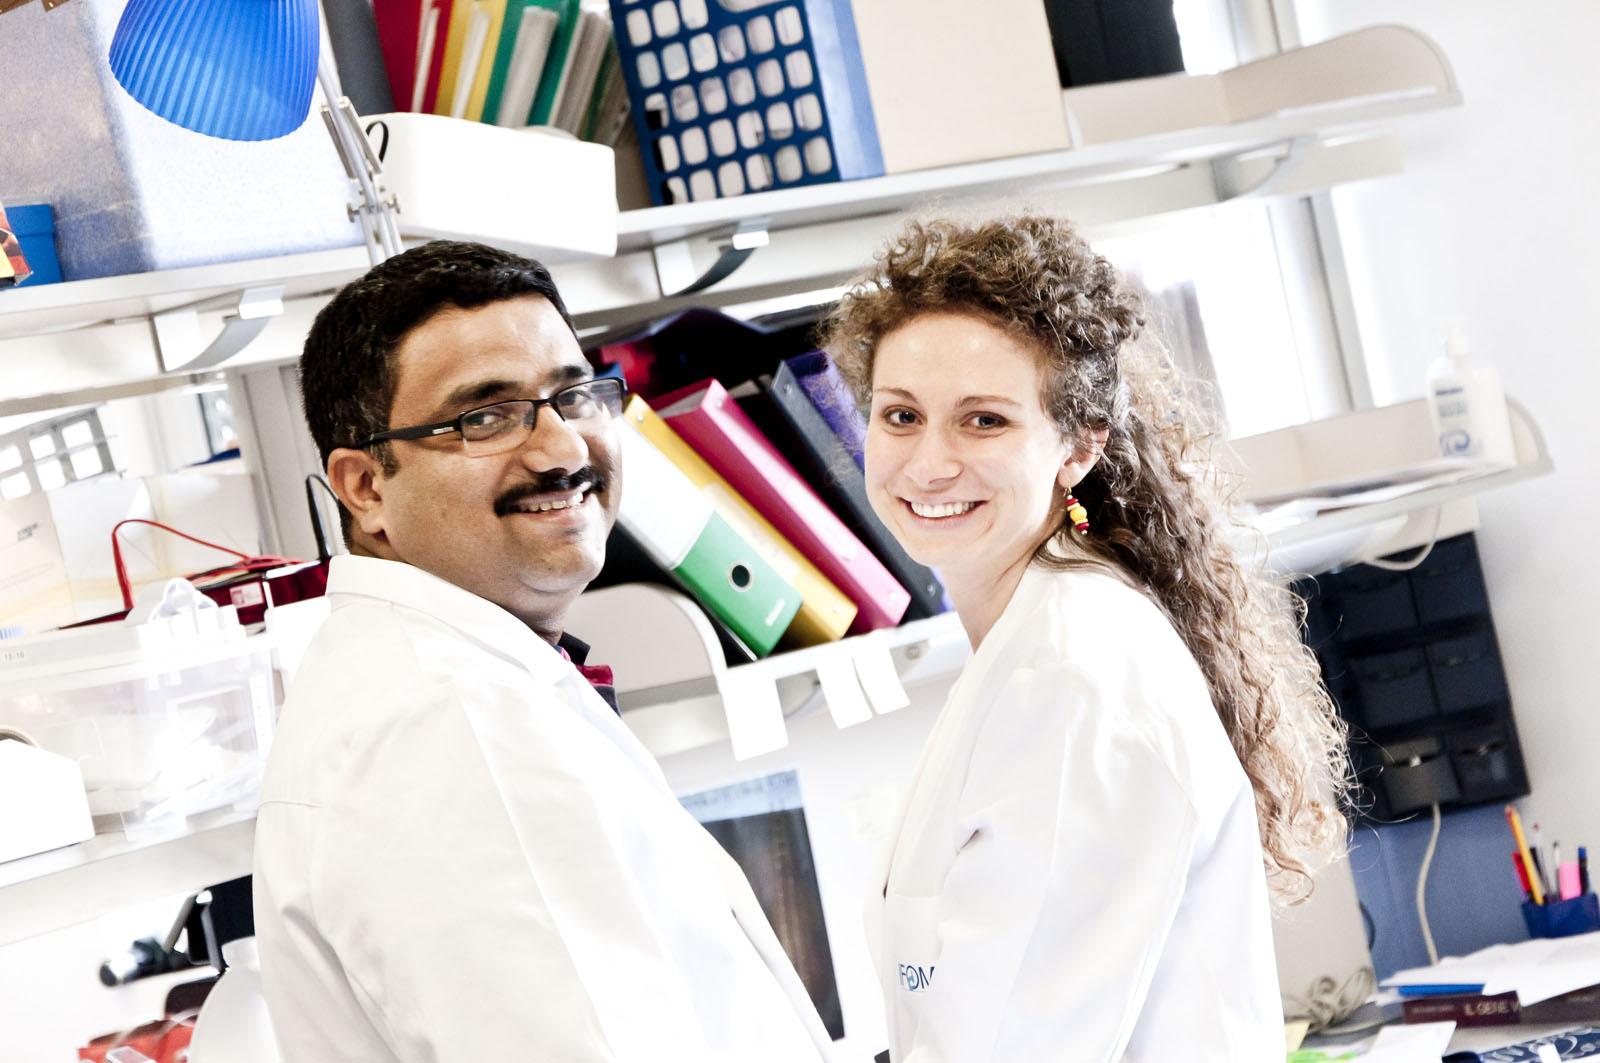 nanotecnologie diagnosi precoce cancro